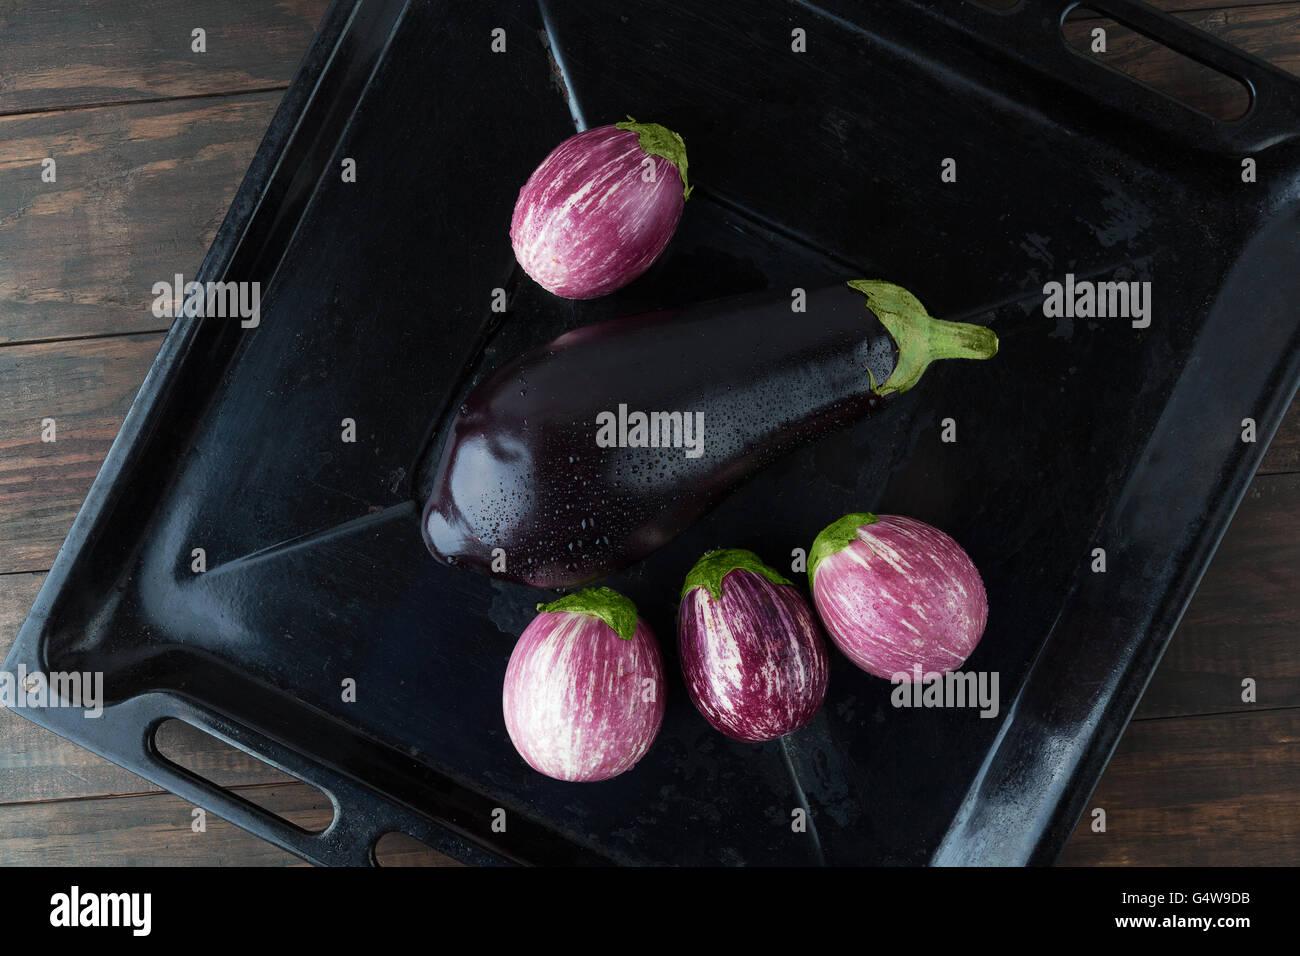 Auberginen - schwarze Magie und lila gestreifte Auberginen in rustikalen Backblech nass. Draufsicht mit Textfreiraum Stockbild